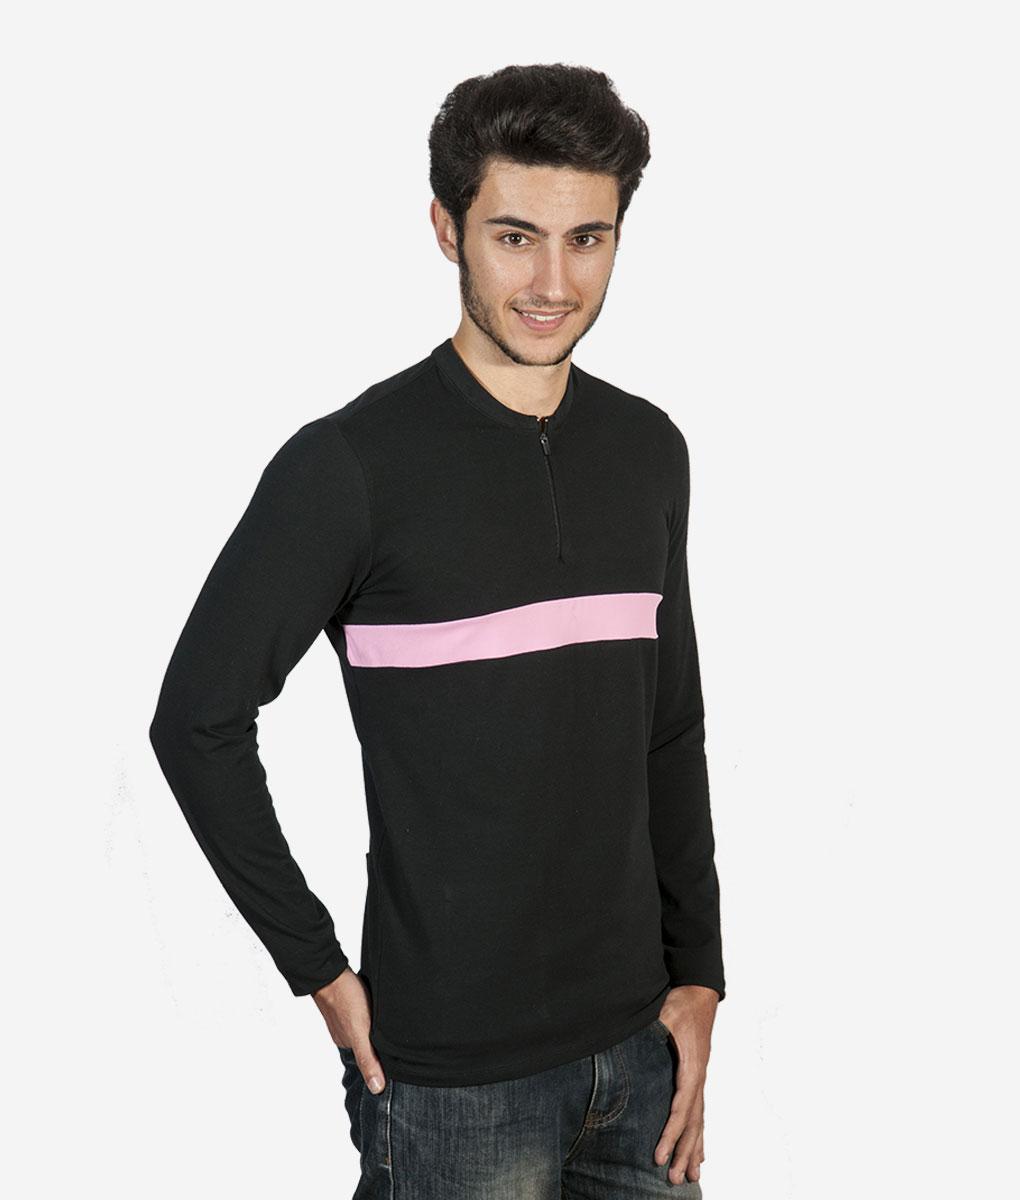 camiseta-negra-rosa-lateral